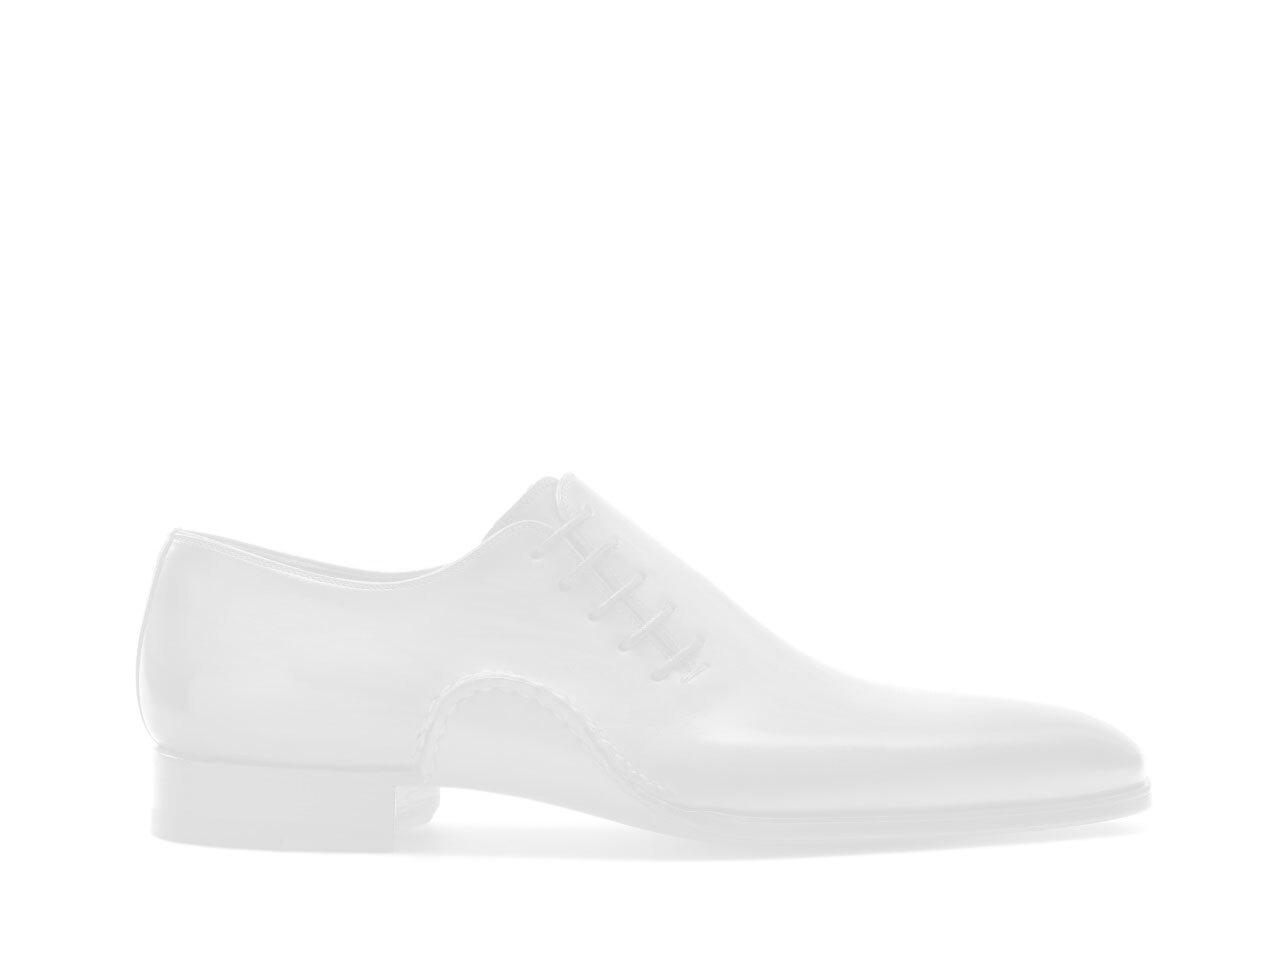 Side view of the Magnanni Dorio Navy Men's Velvet Loafers